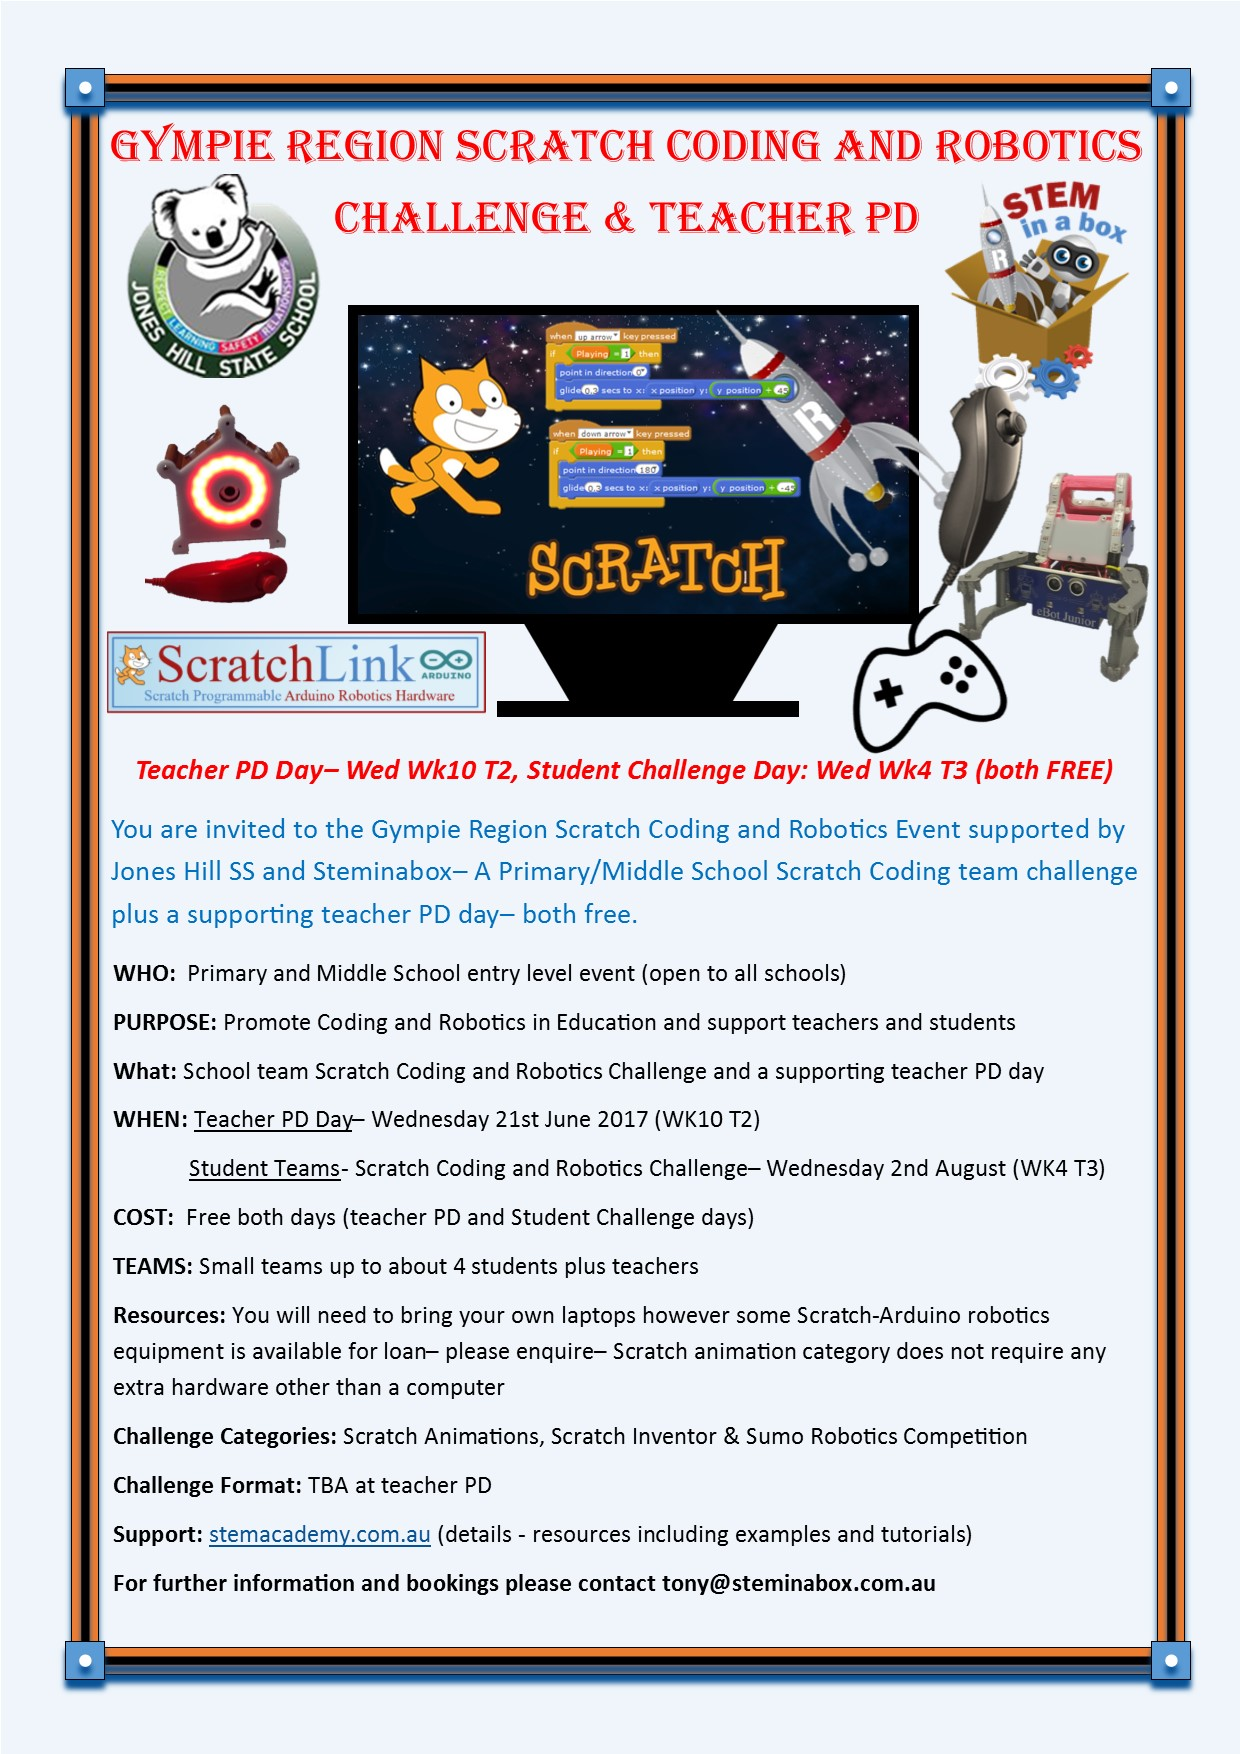 Gympie Scratch Coding & Robotics Challenge